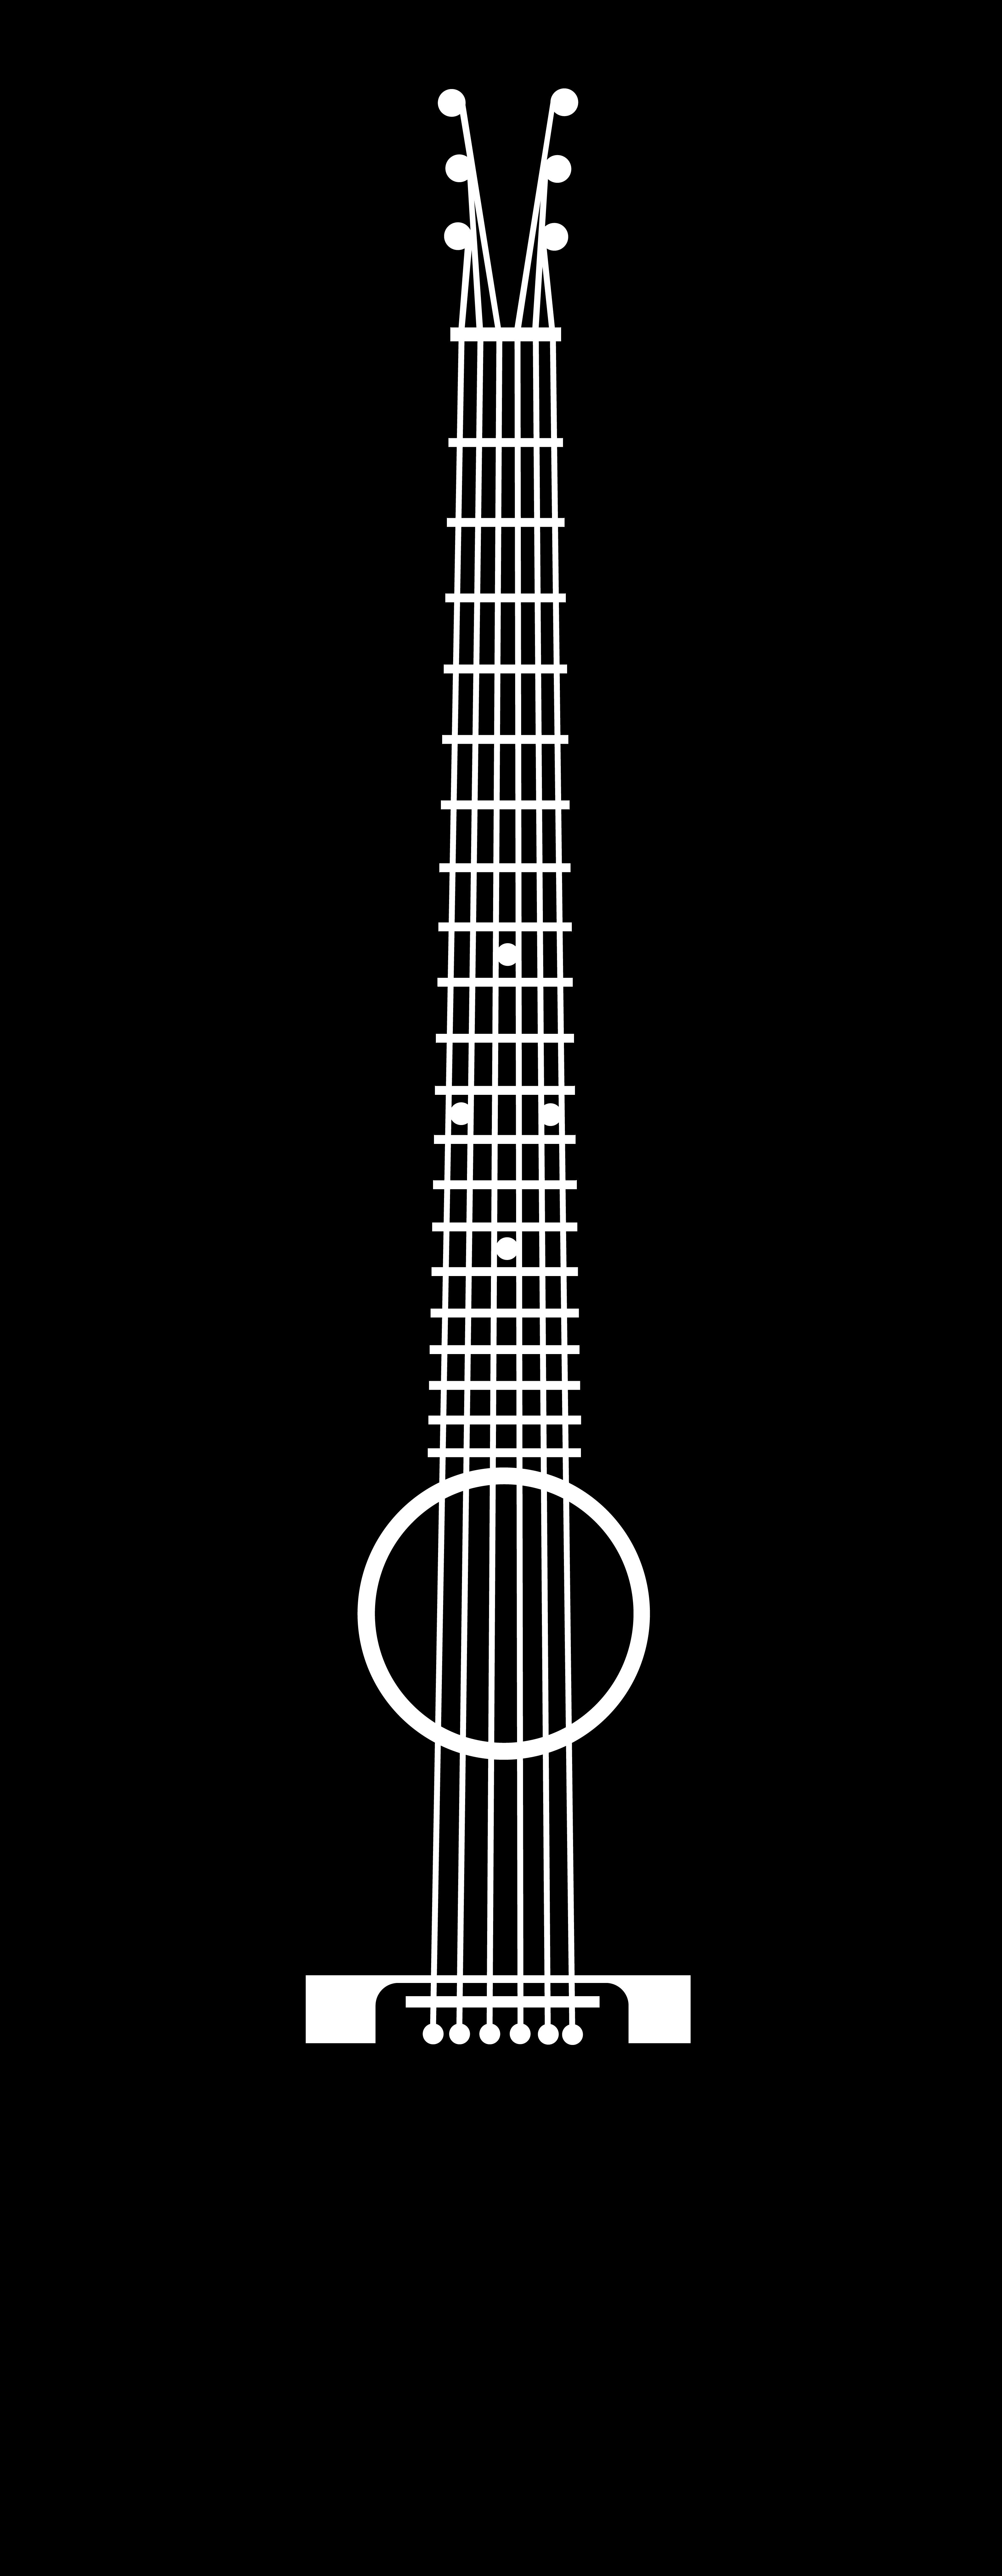 Acoustic Guitar Black Silhouette Png 3184 8188 Guitar Illustration Free Clip Art Guitar Art